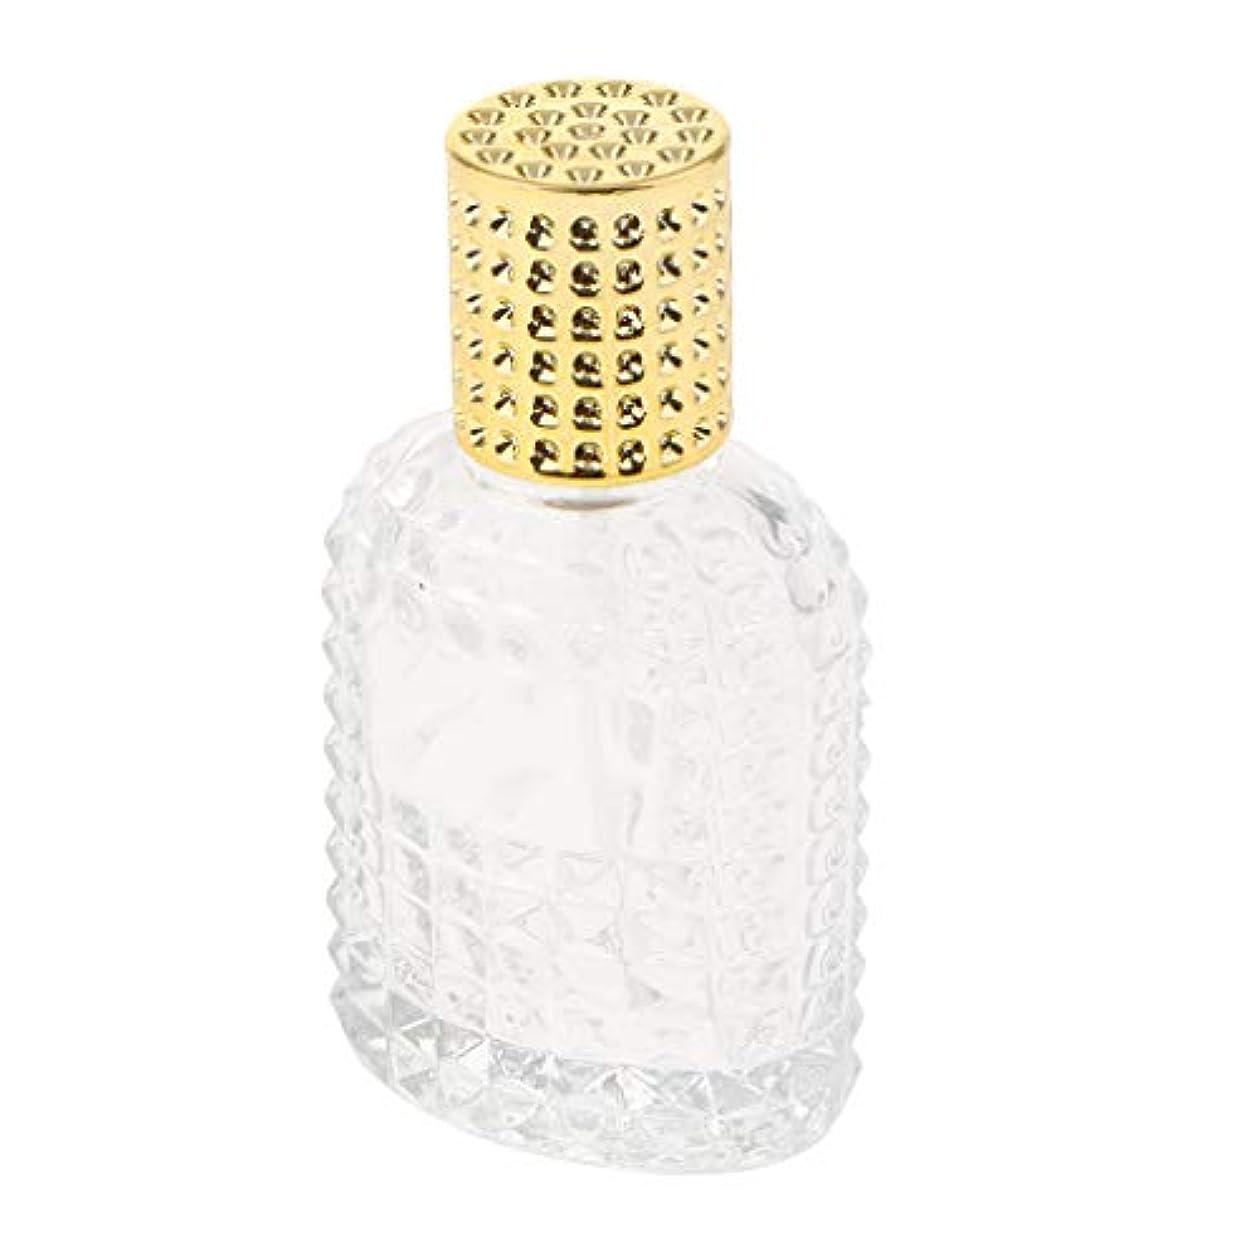 SM SunniMix ガラス 香水瓶 空 スプレー香水ボトル 美しいパイナップルデザイン 詰め替え可能 全4種 - ゴールド50ml